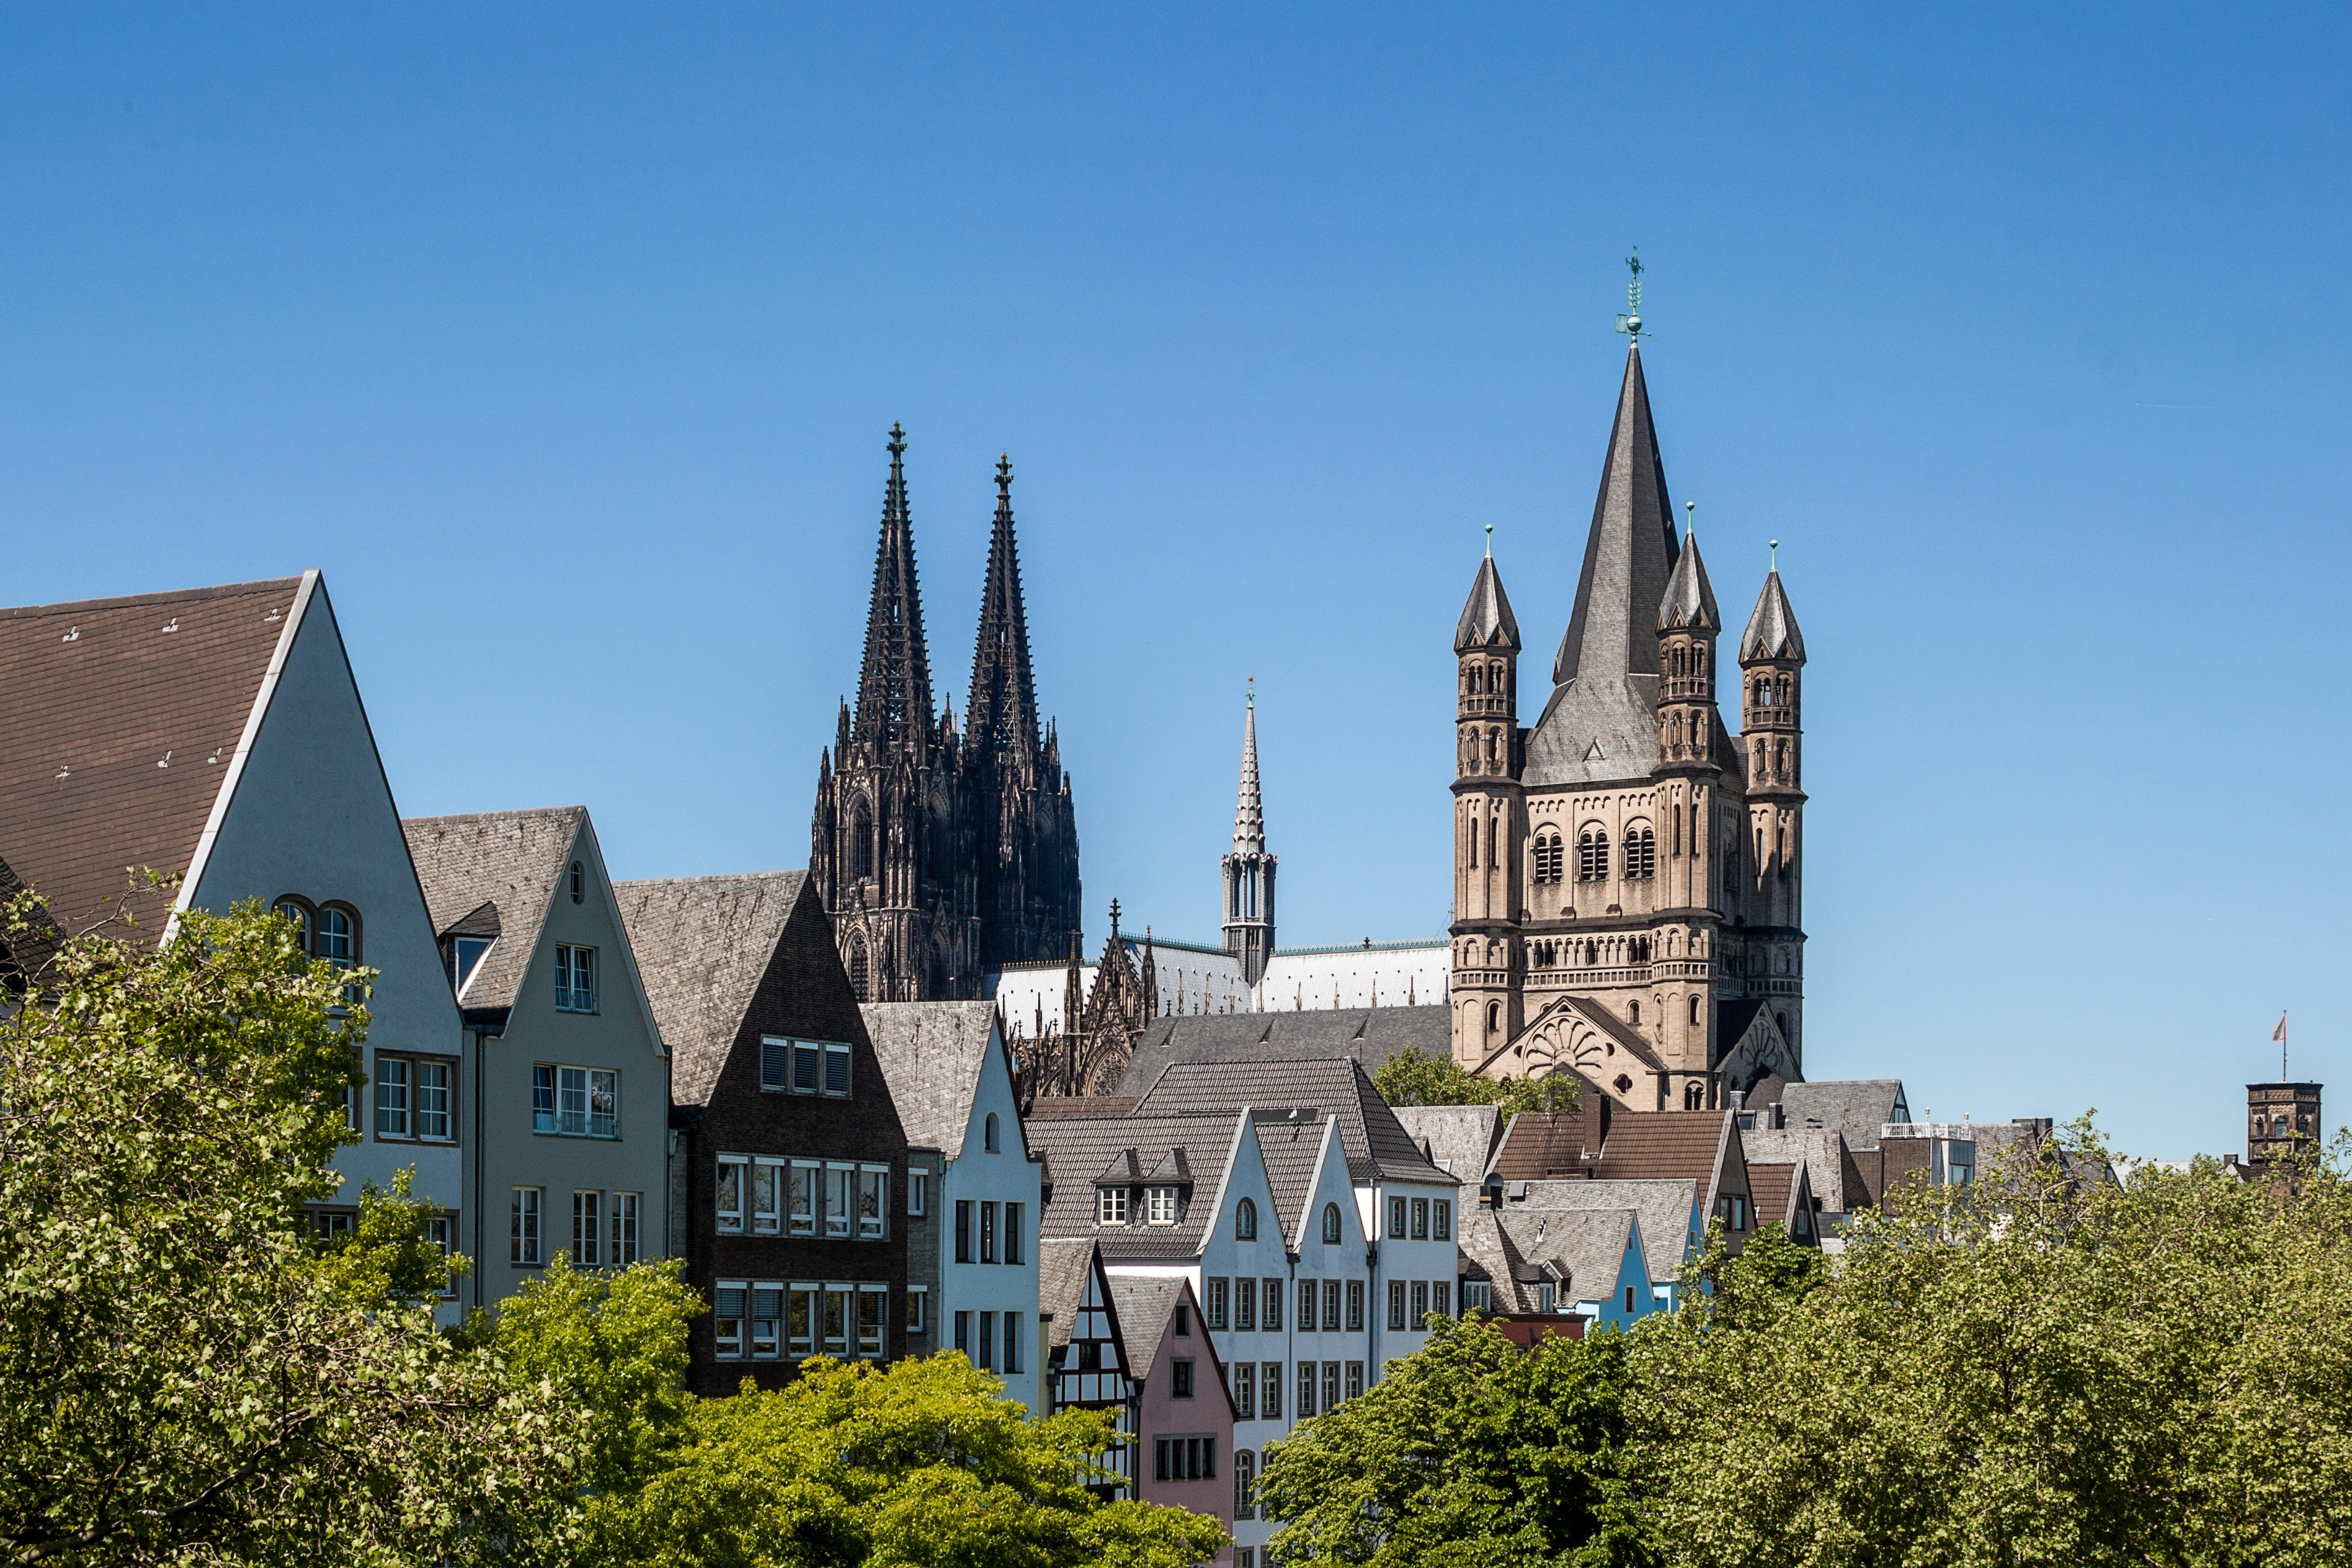 Rheine, North Rhine-Westphalia, Germany